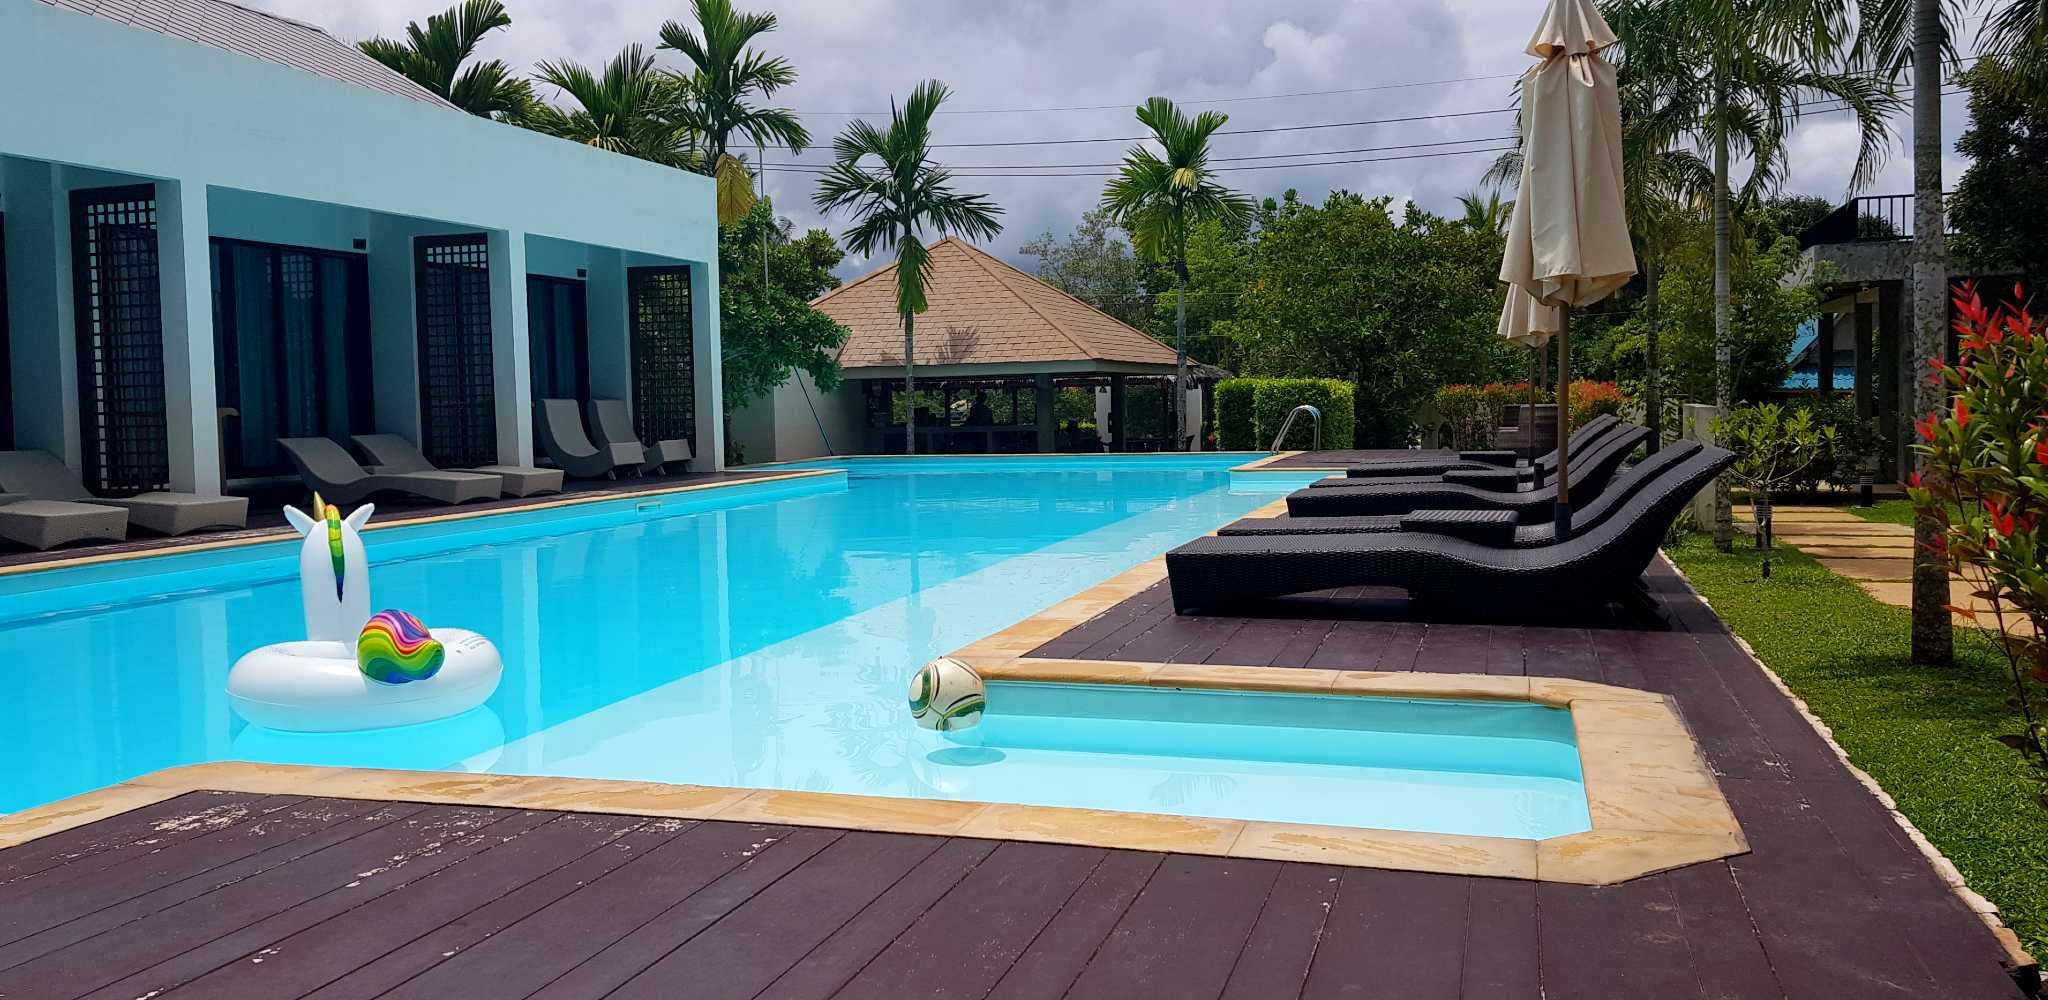 MookLamai Resort met zwembad en bungalows op Koh Mook